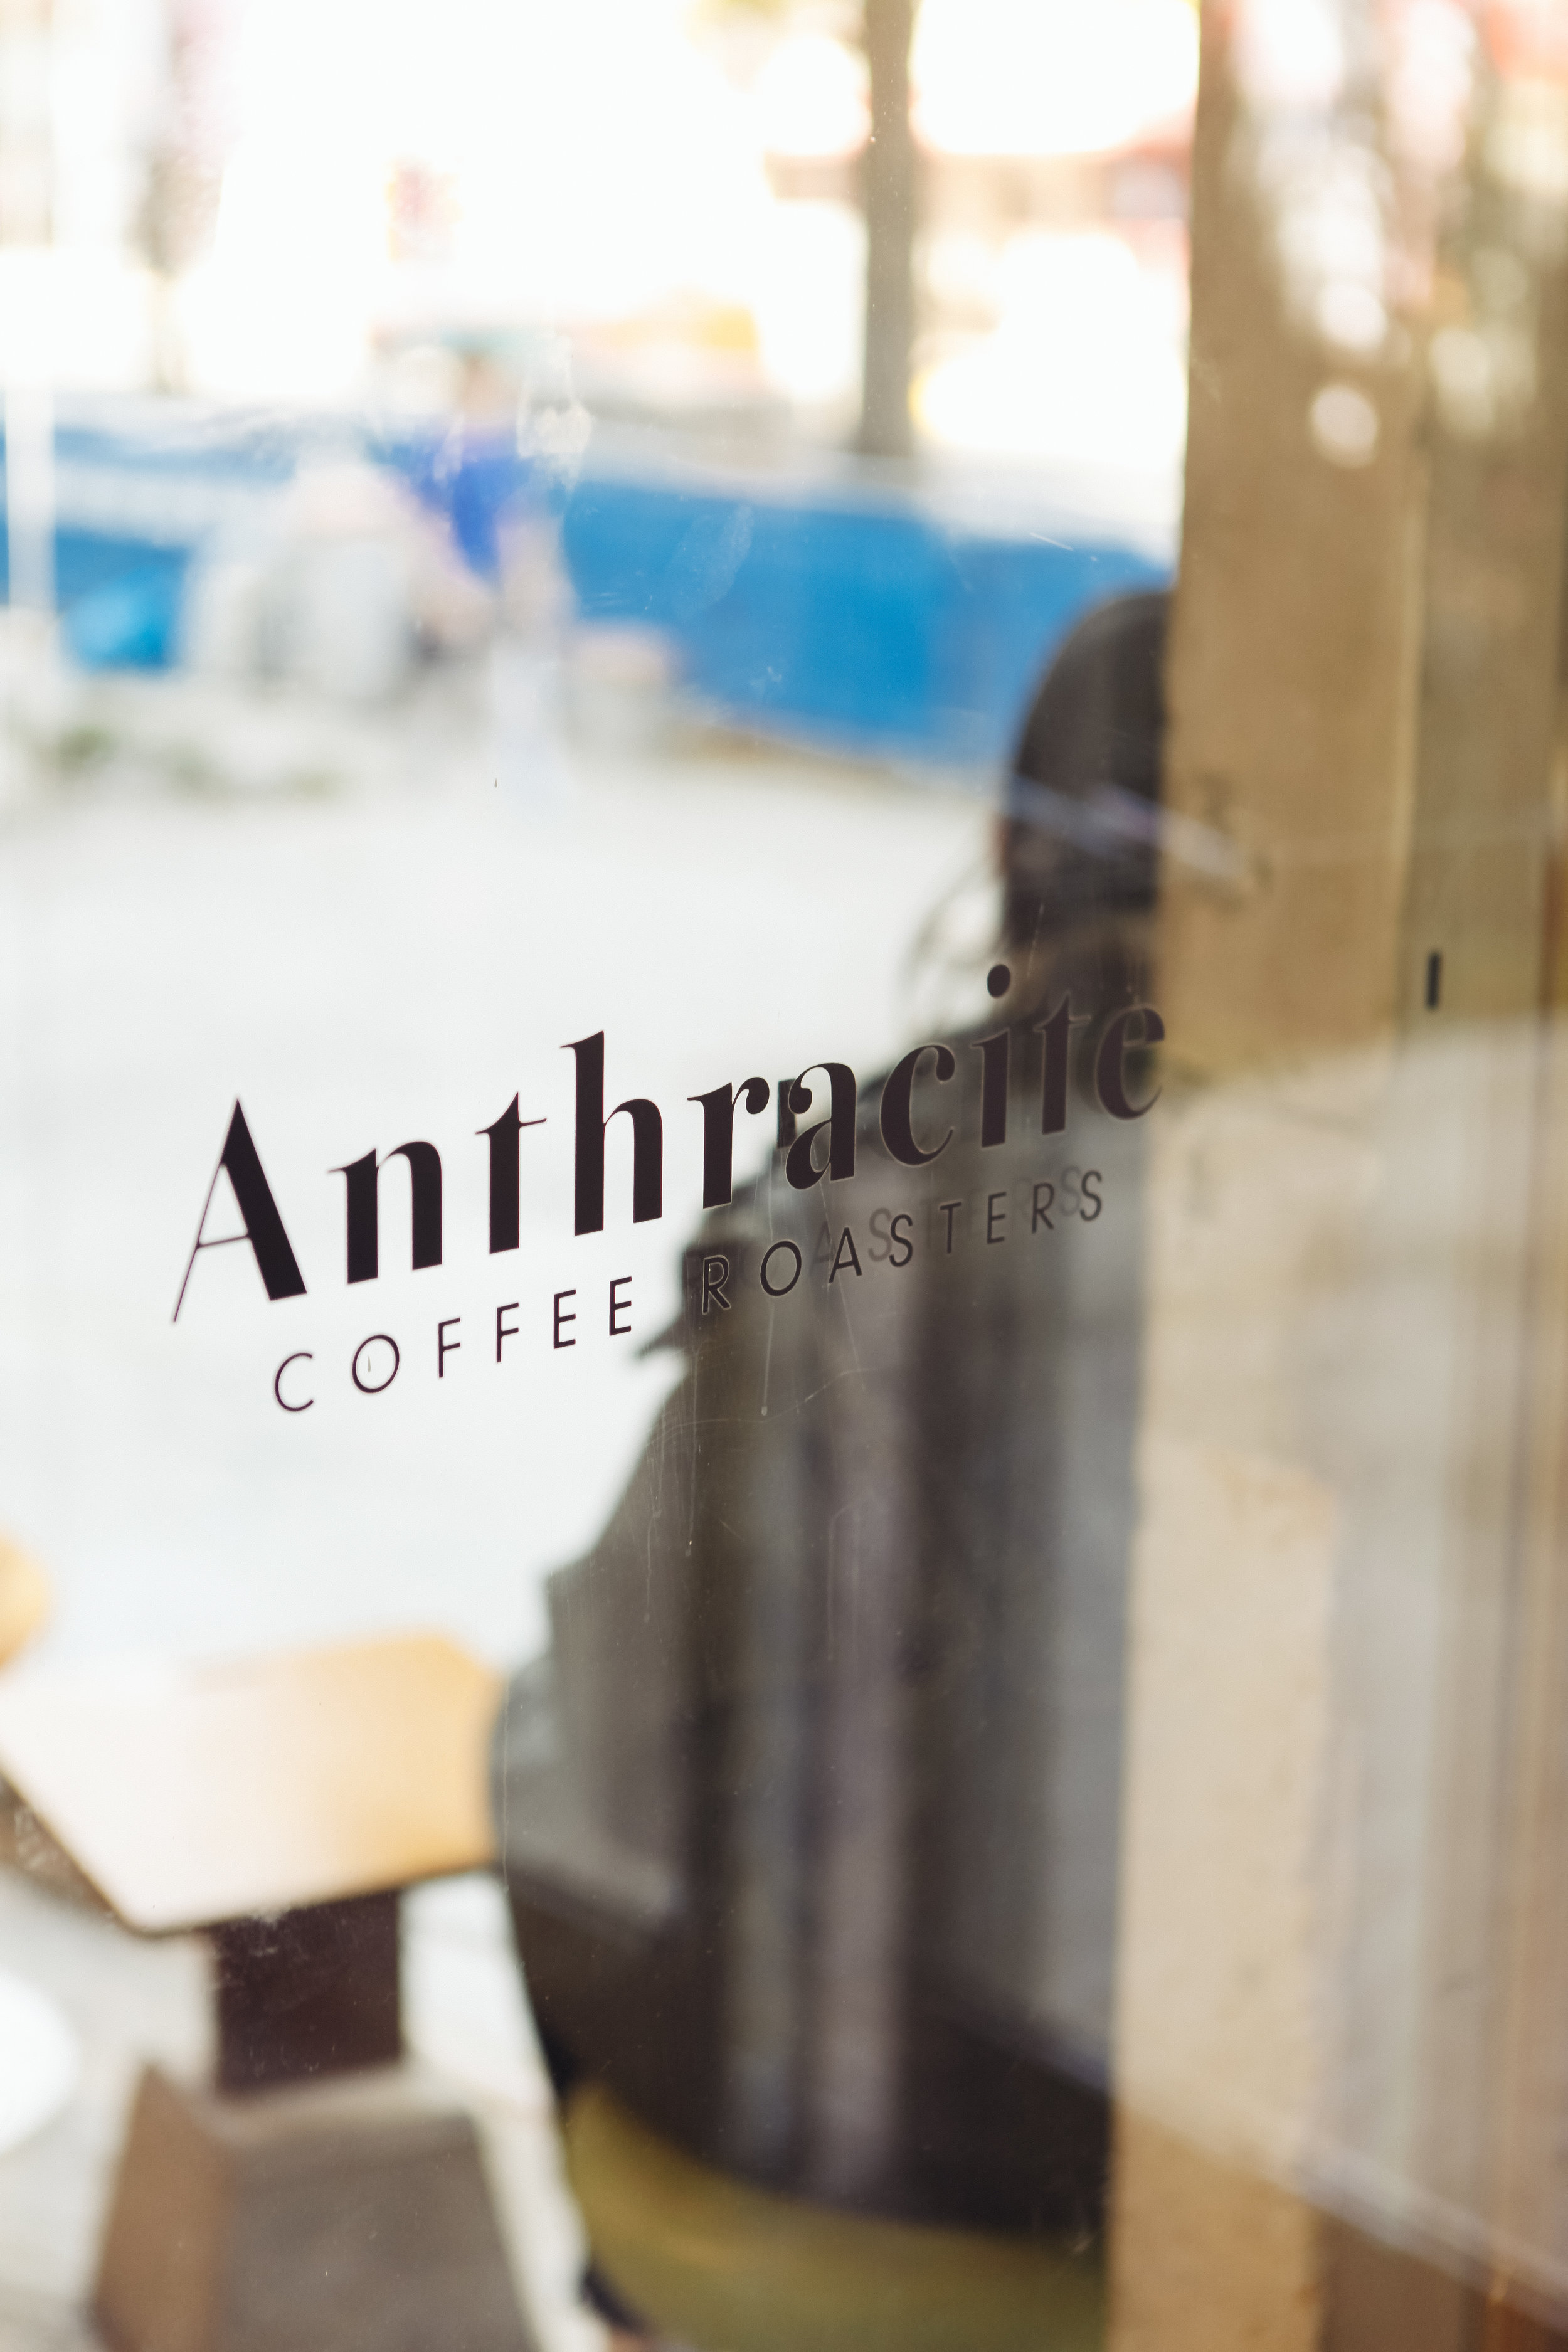 ANTHRACITE1.jpg